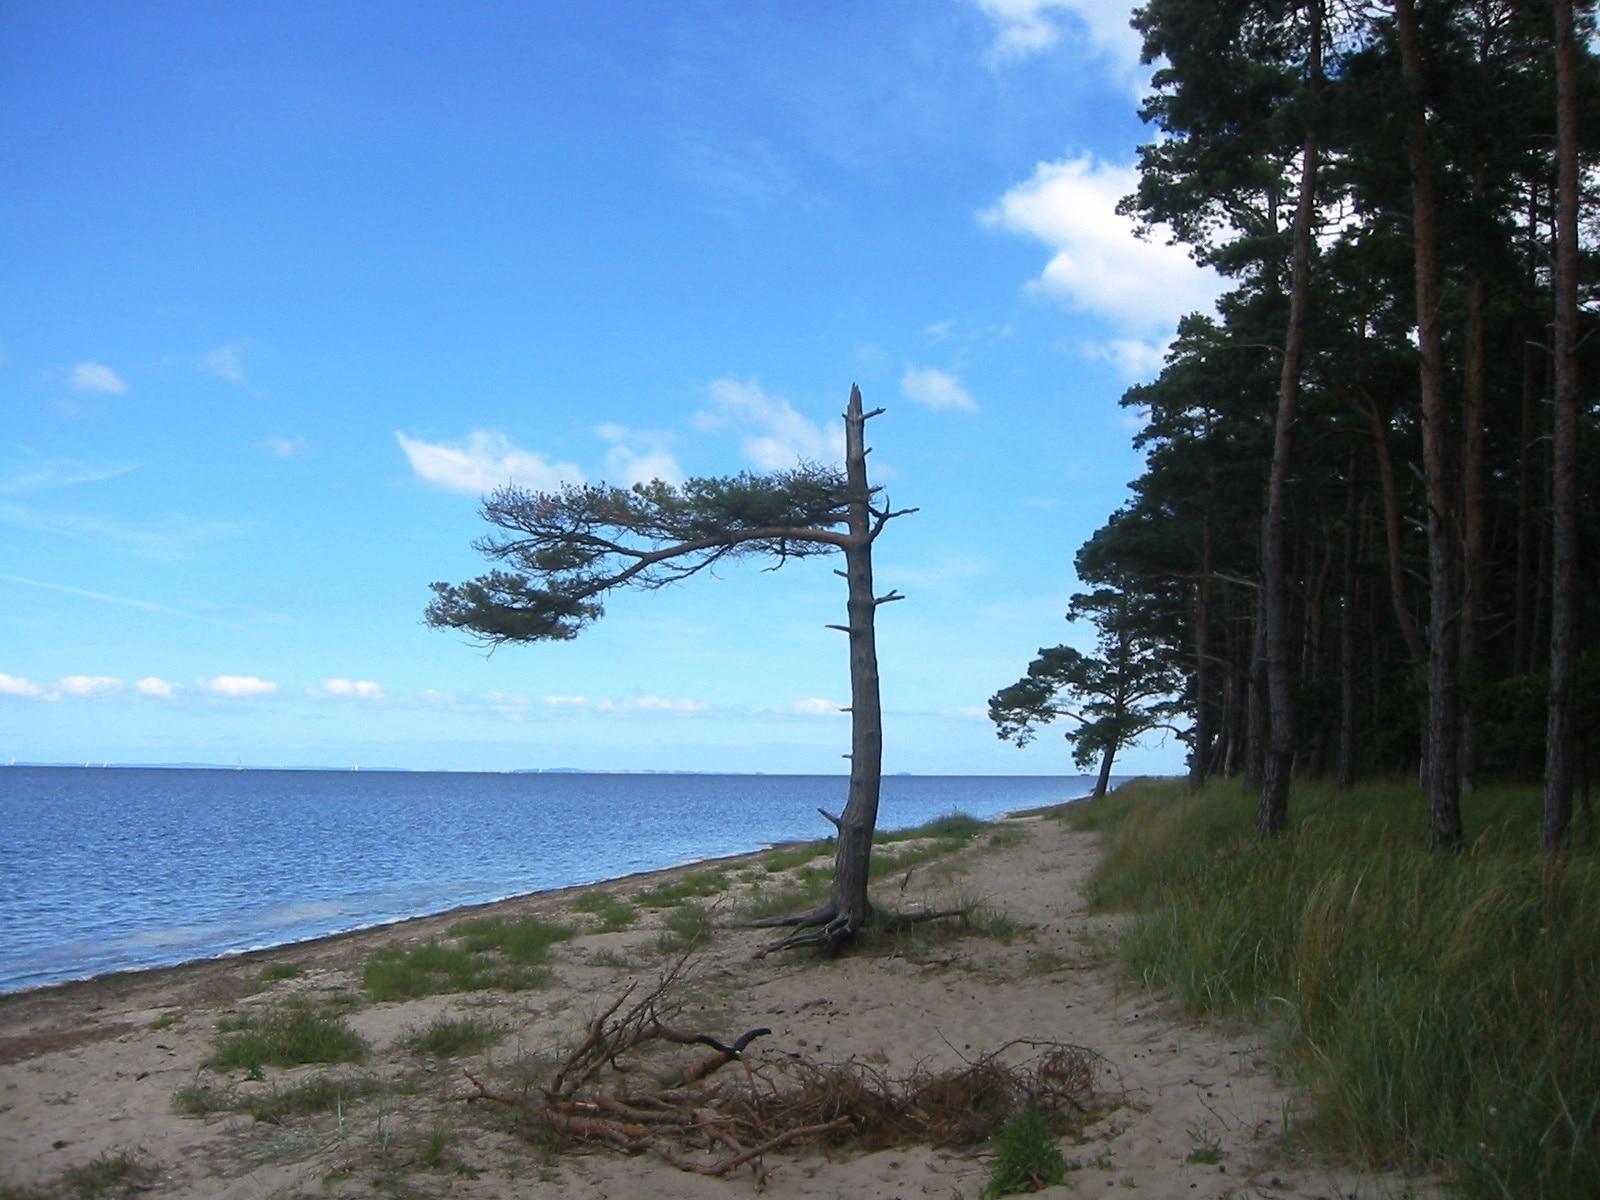 Loissin, Mecklenburg-West Pomerania, Germany